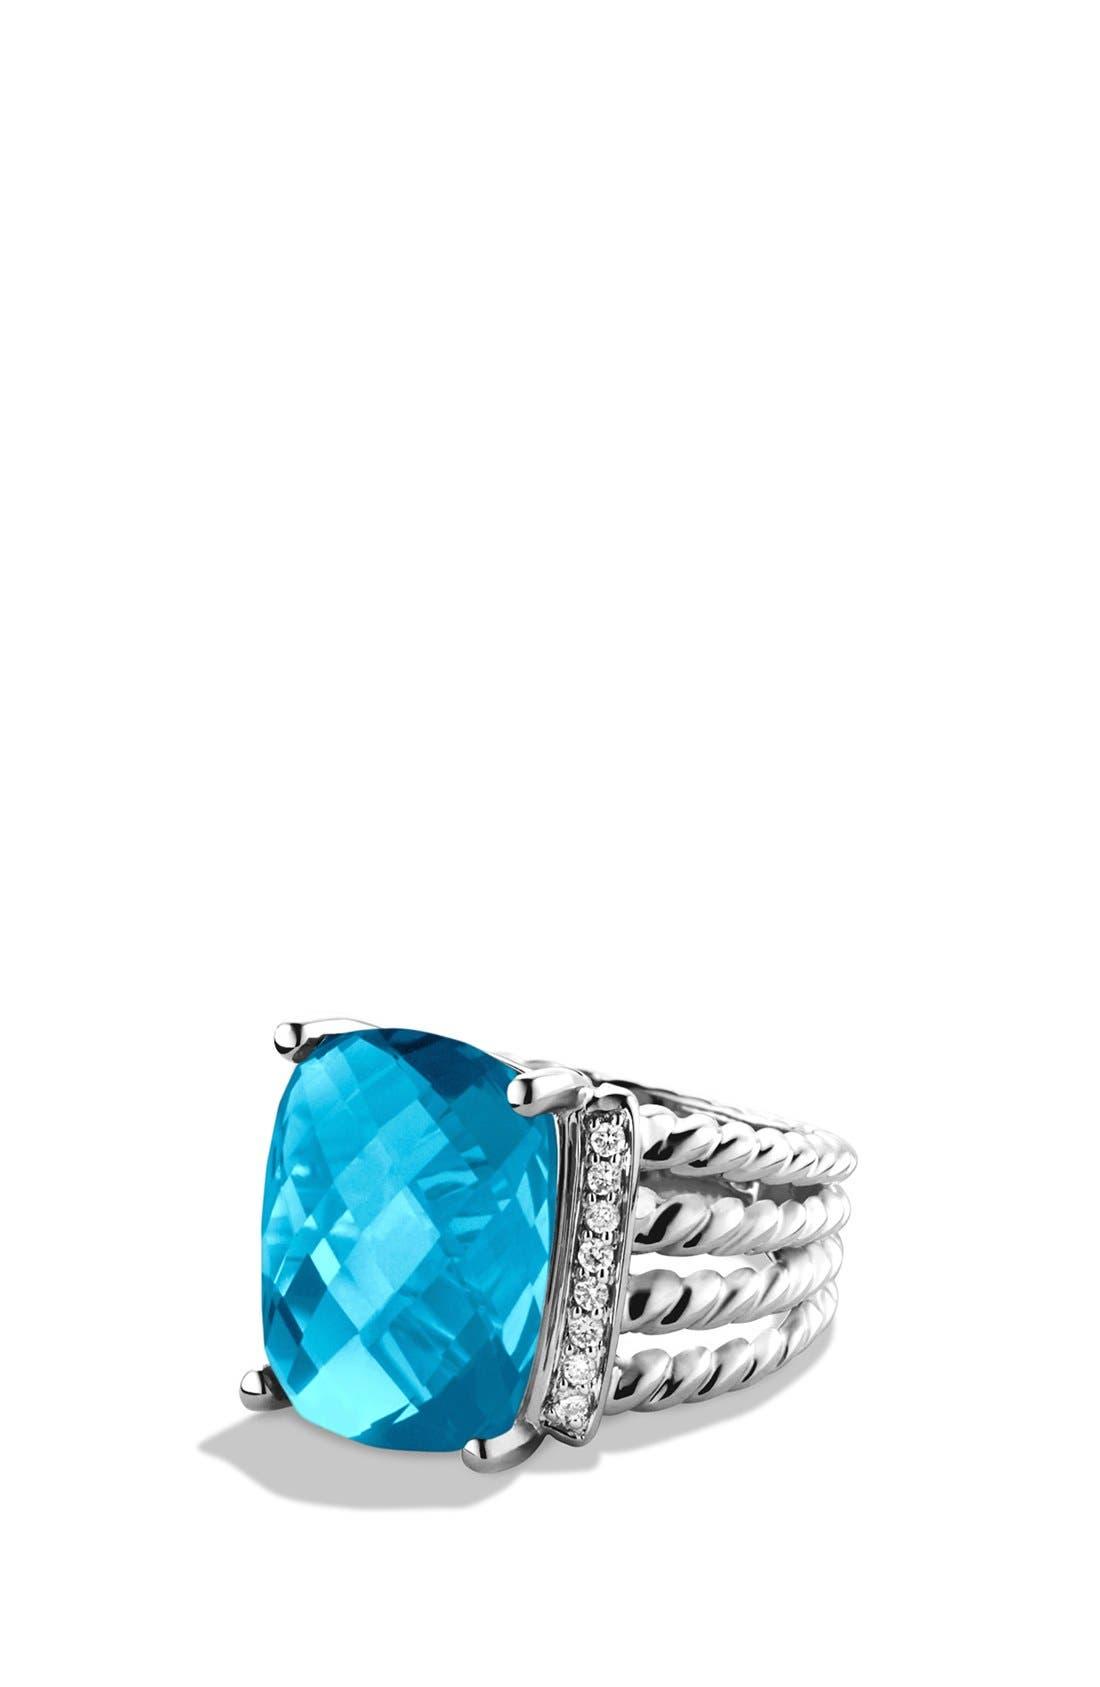 'Wheaton' Ring with Semiprecious Stone & Diamonds,                         Main,                         color, Blue Topaz